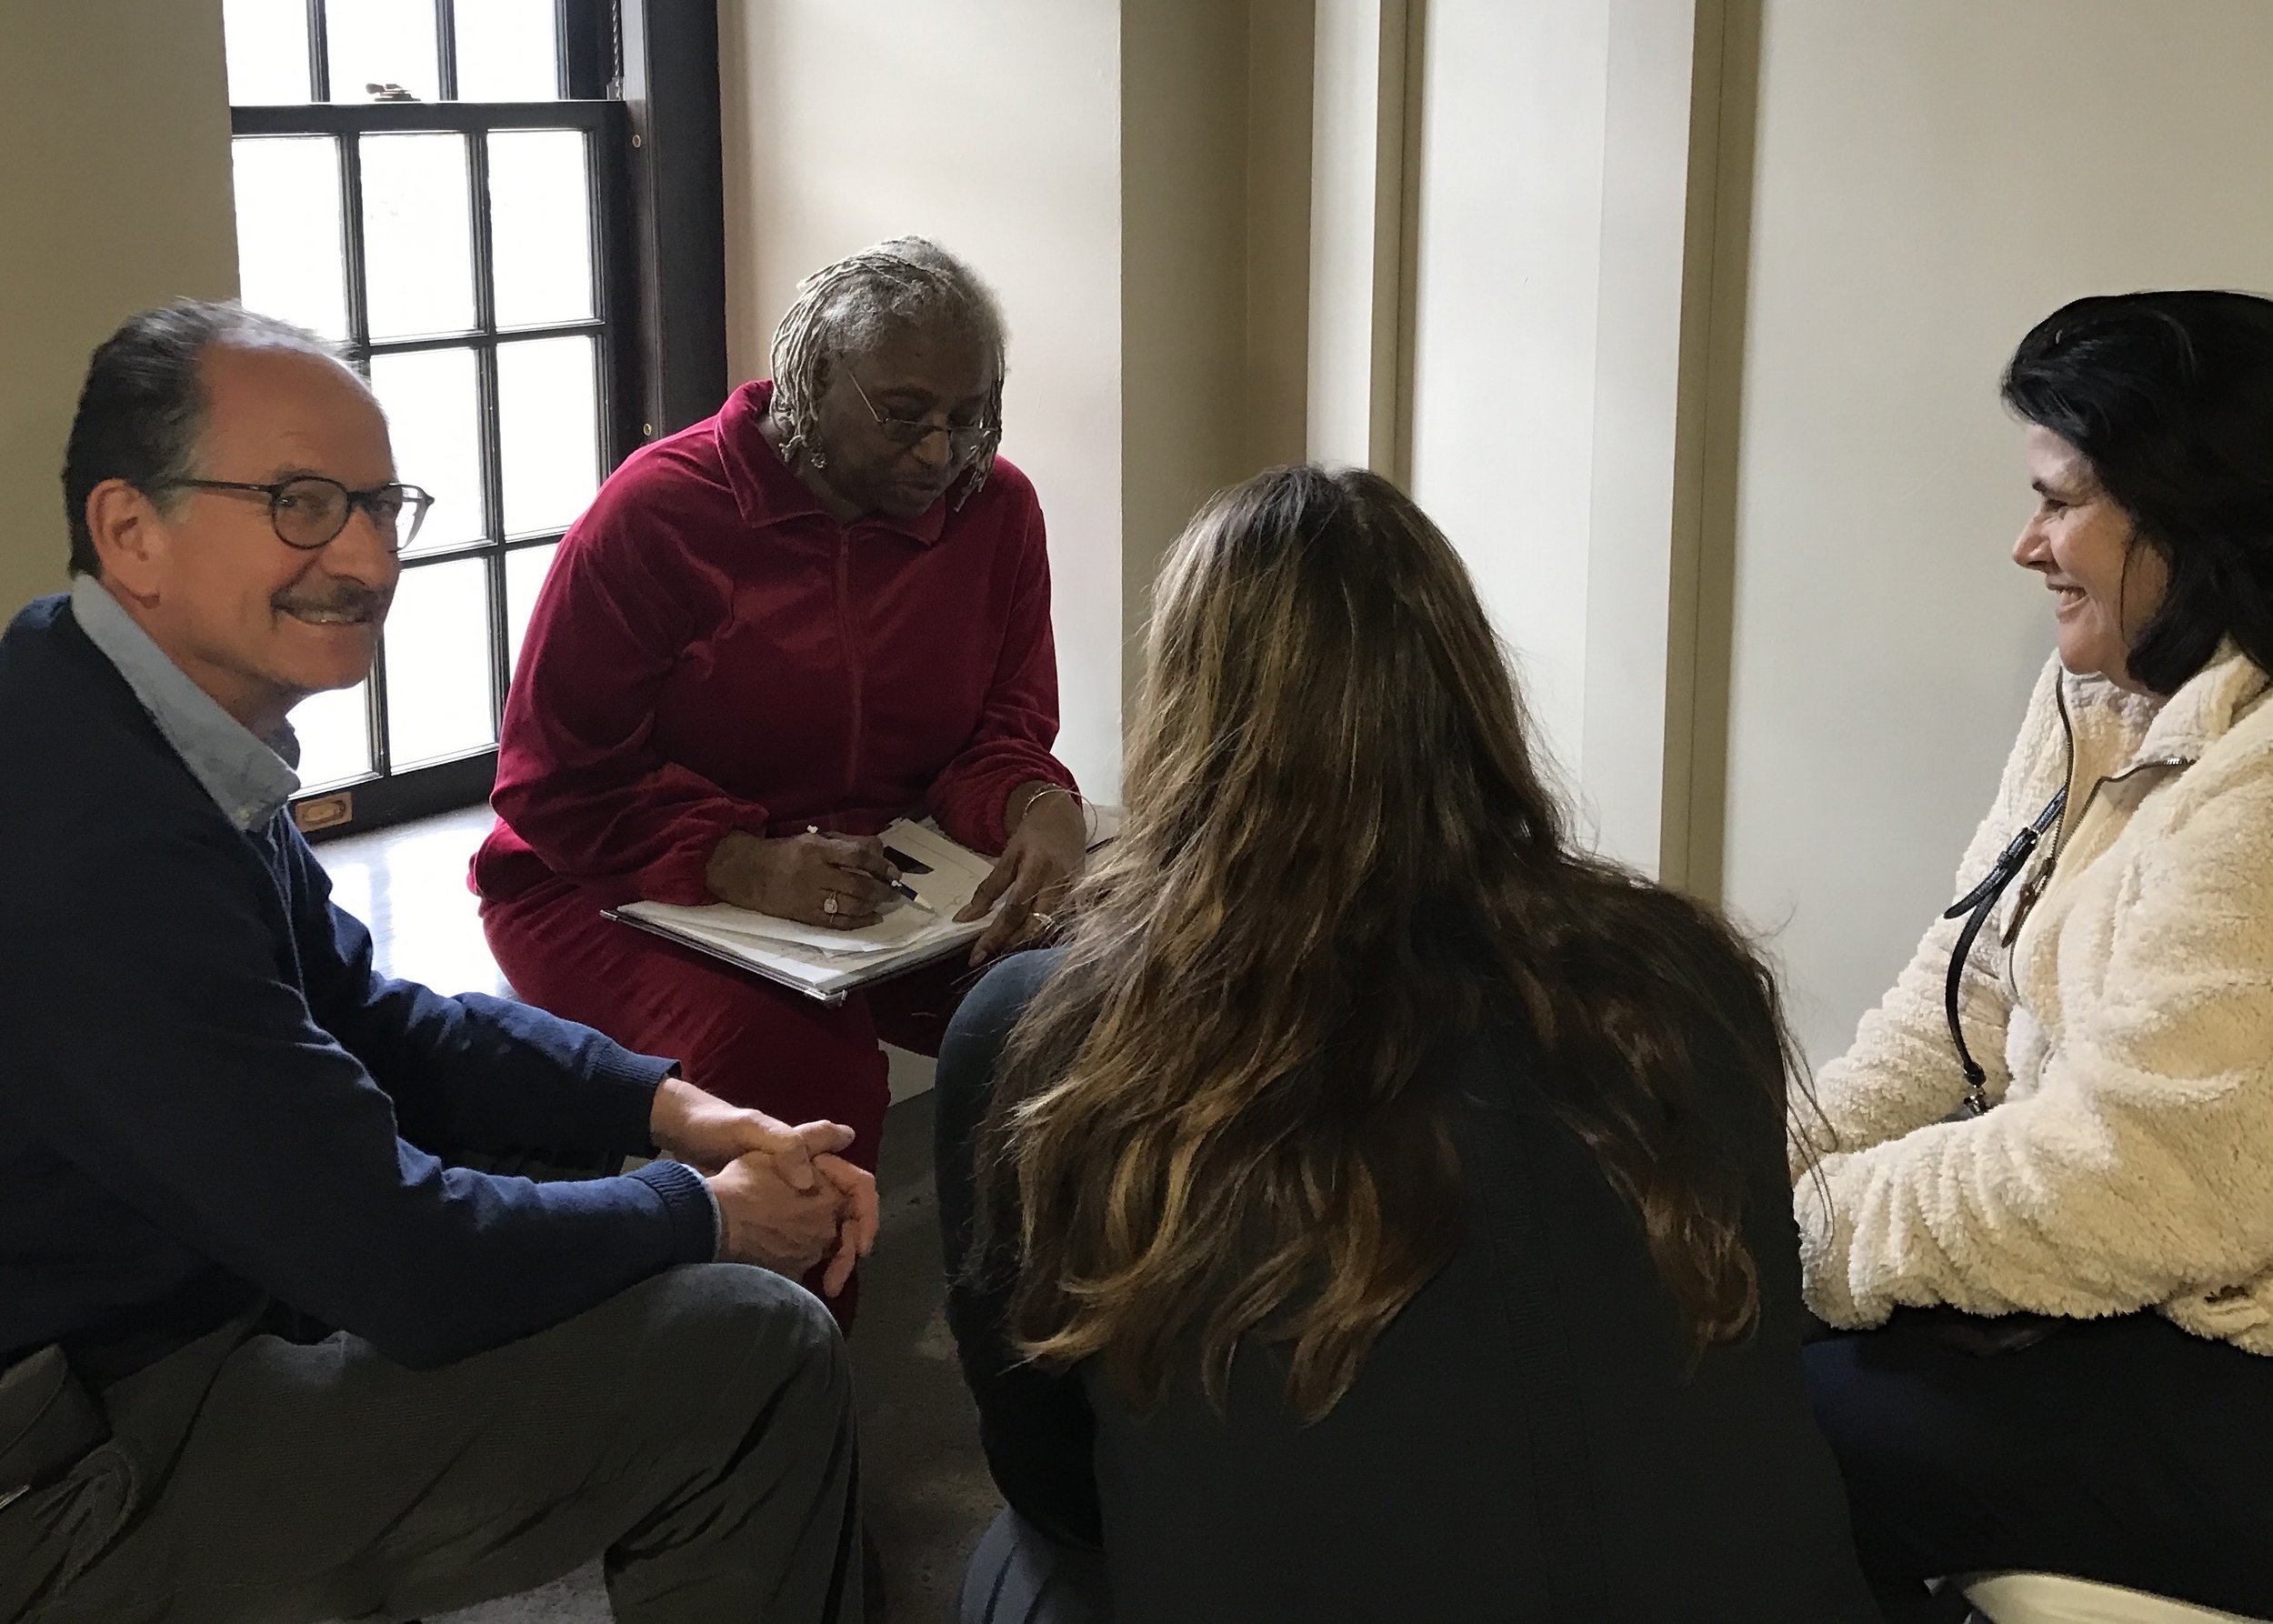 Underground Railroad Heritage Center, National Heritage Area Training